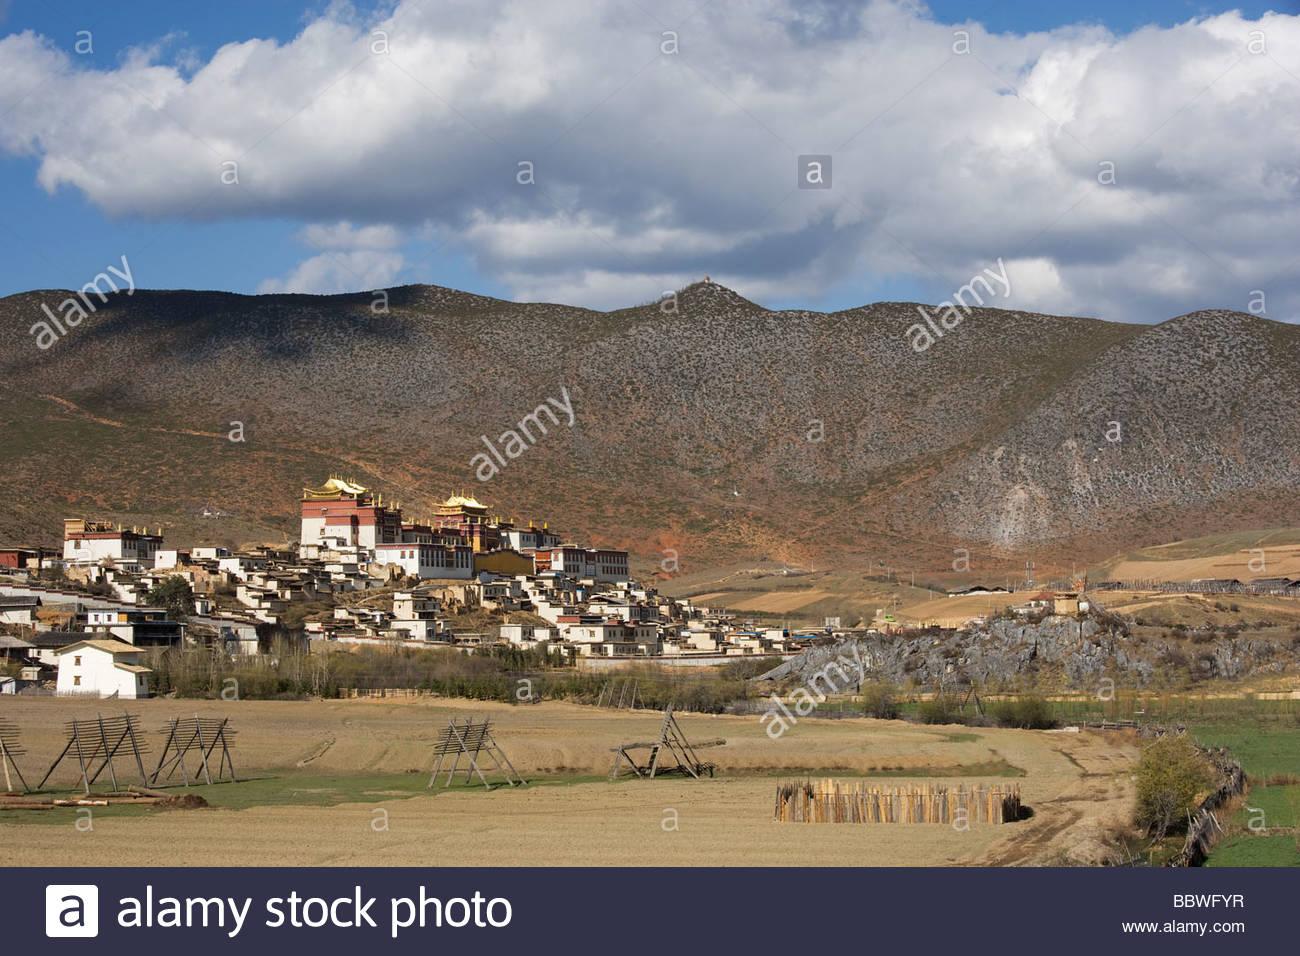 Monastero Buddista ganden sumsteling gompa, zhongdian, Shangri-la, Yunnan, Cina, Asia Immagini Stock